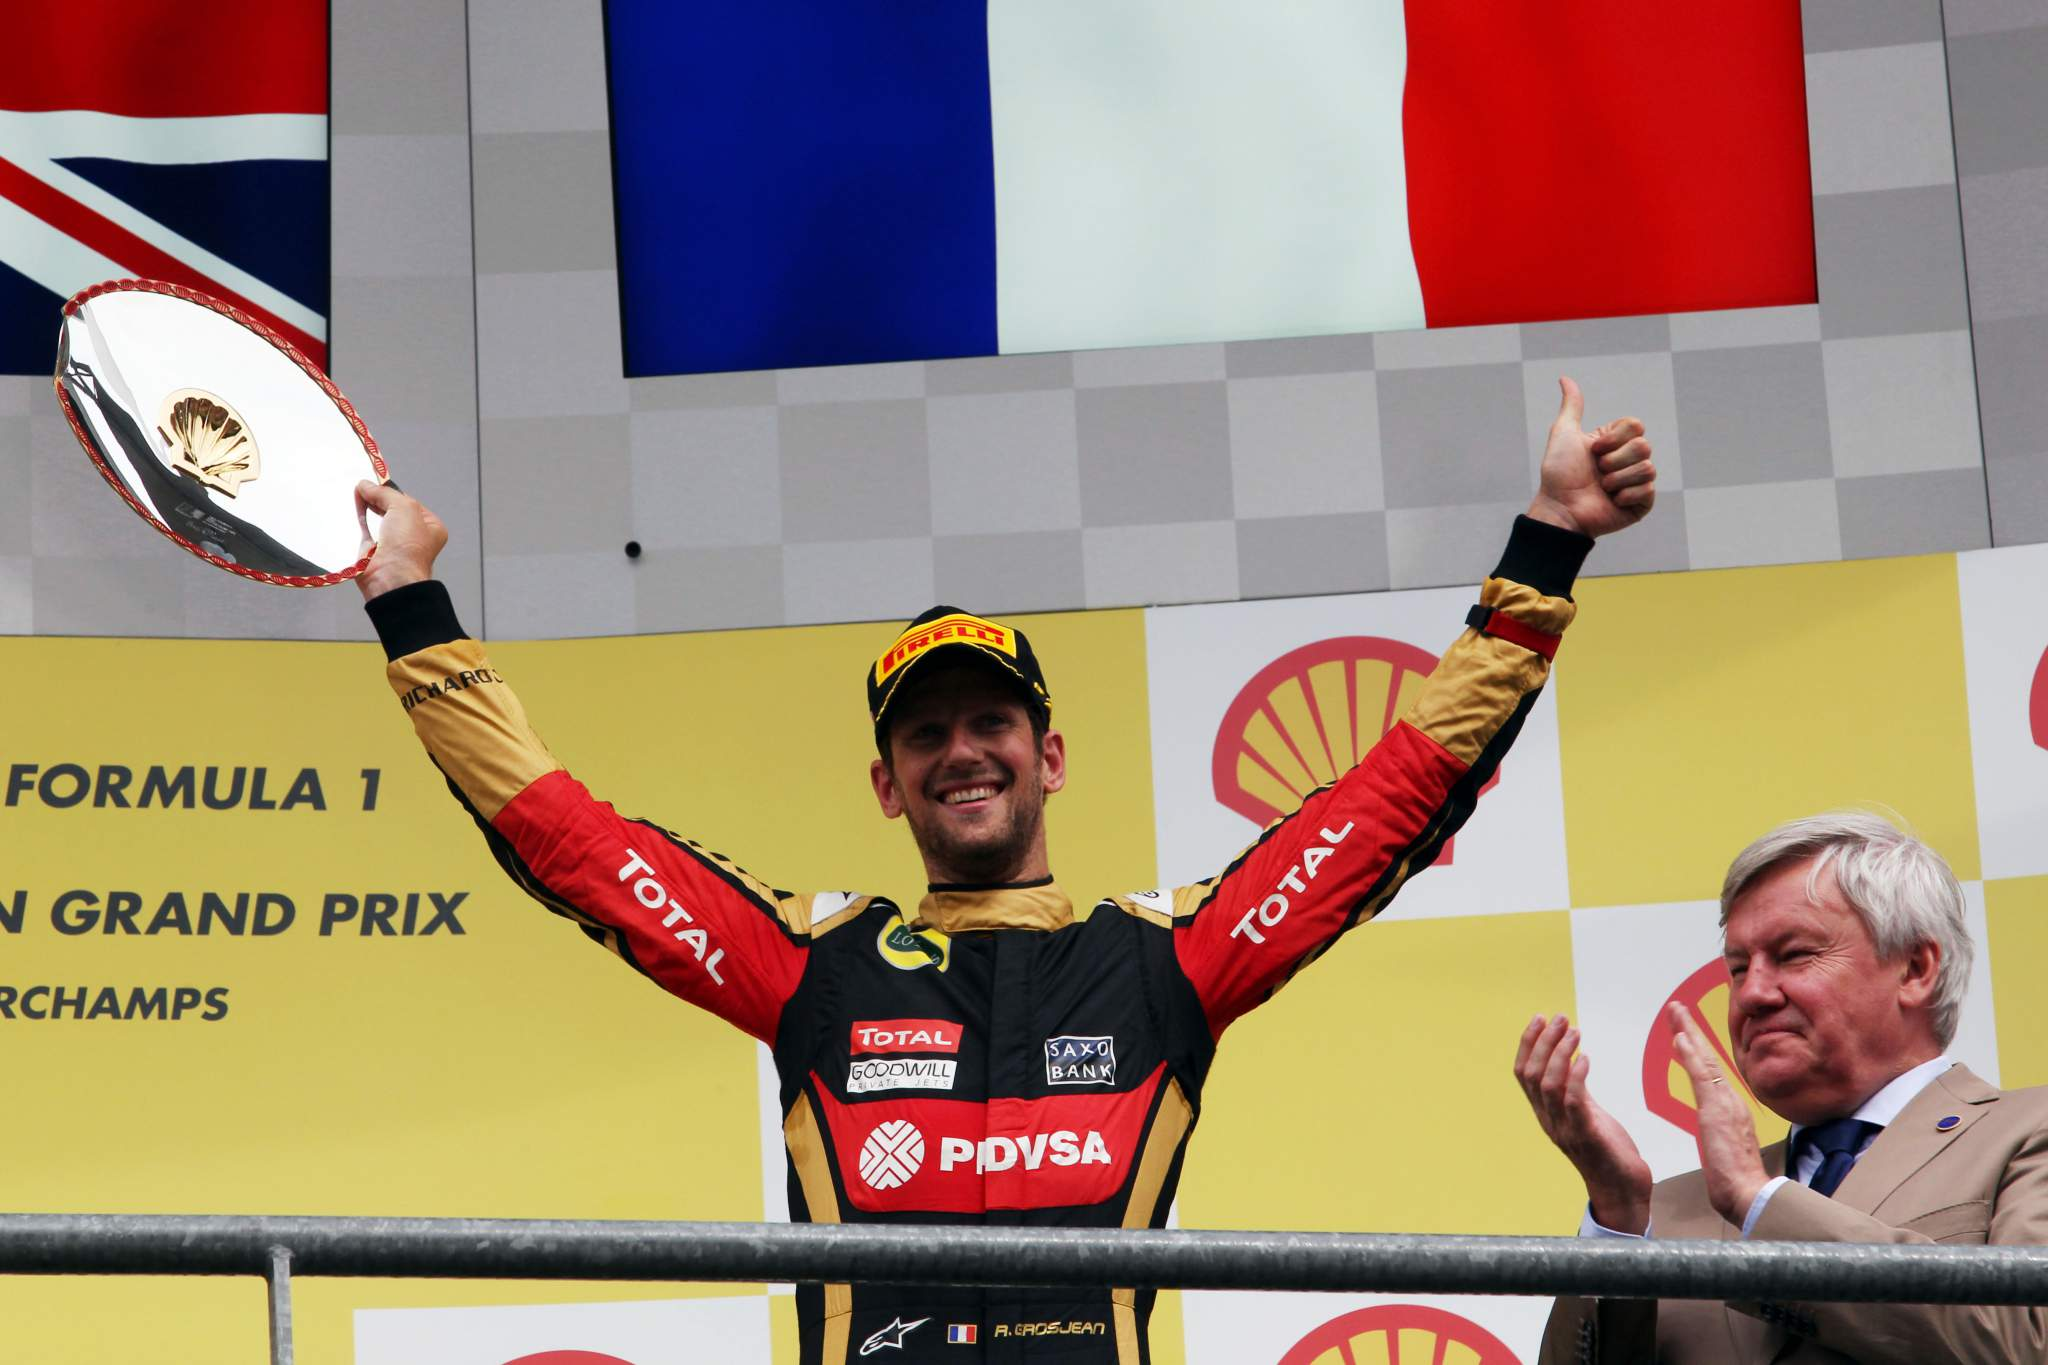 Motor Racing Formula One World Championship Belgian Grand Prix Race Day Spa Francorchamps, Belgium